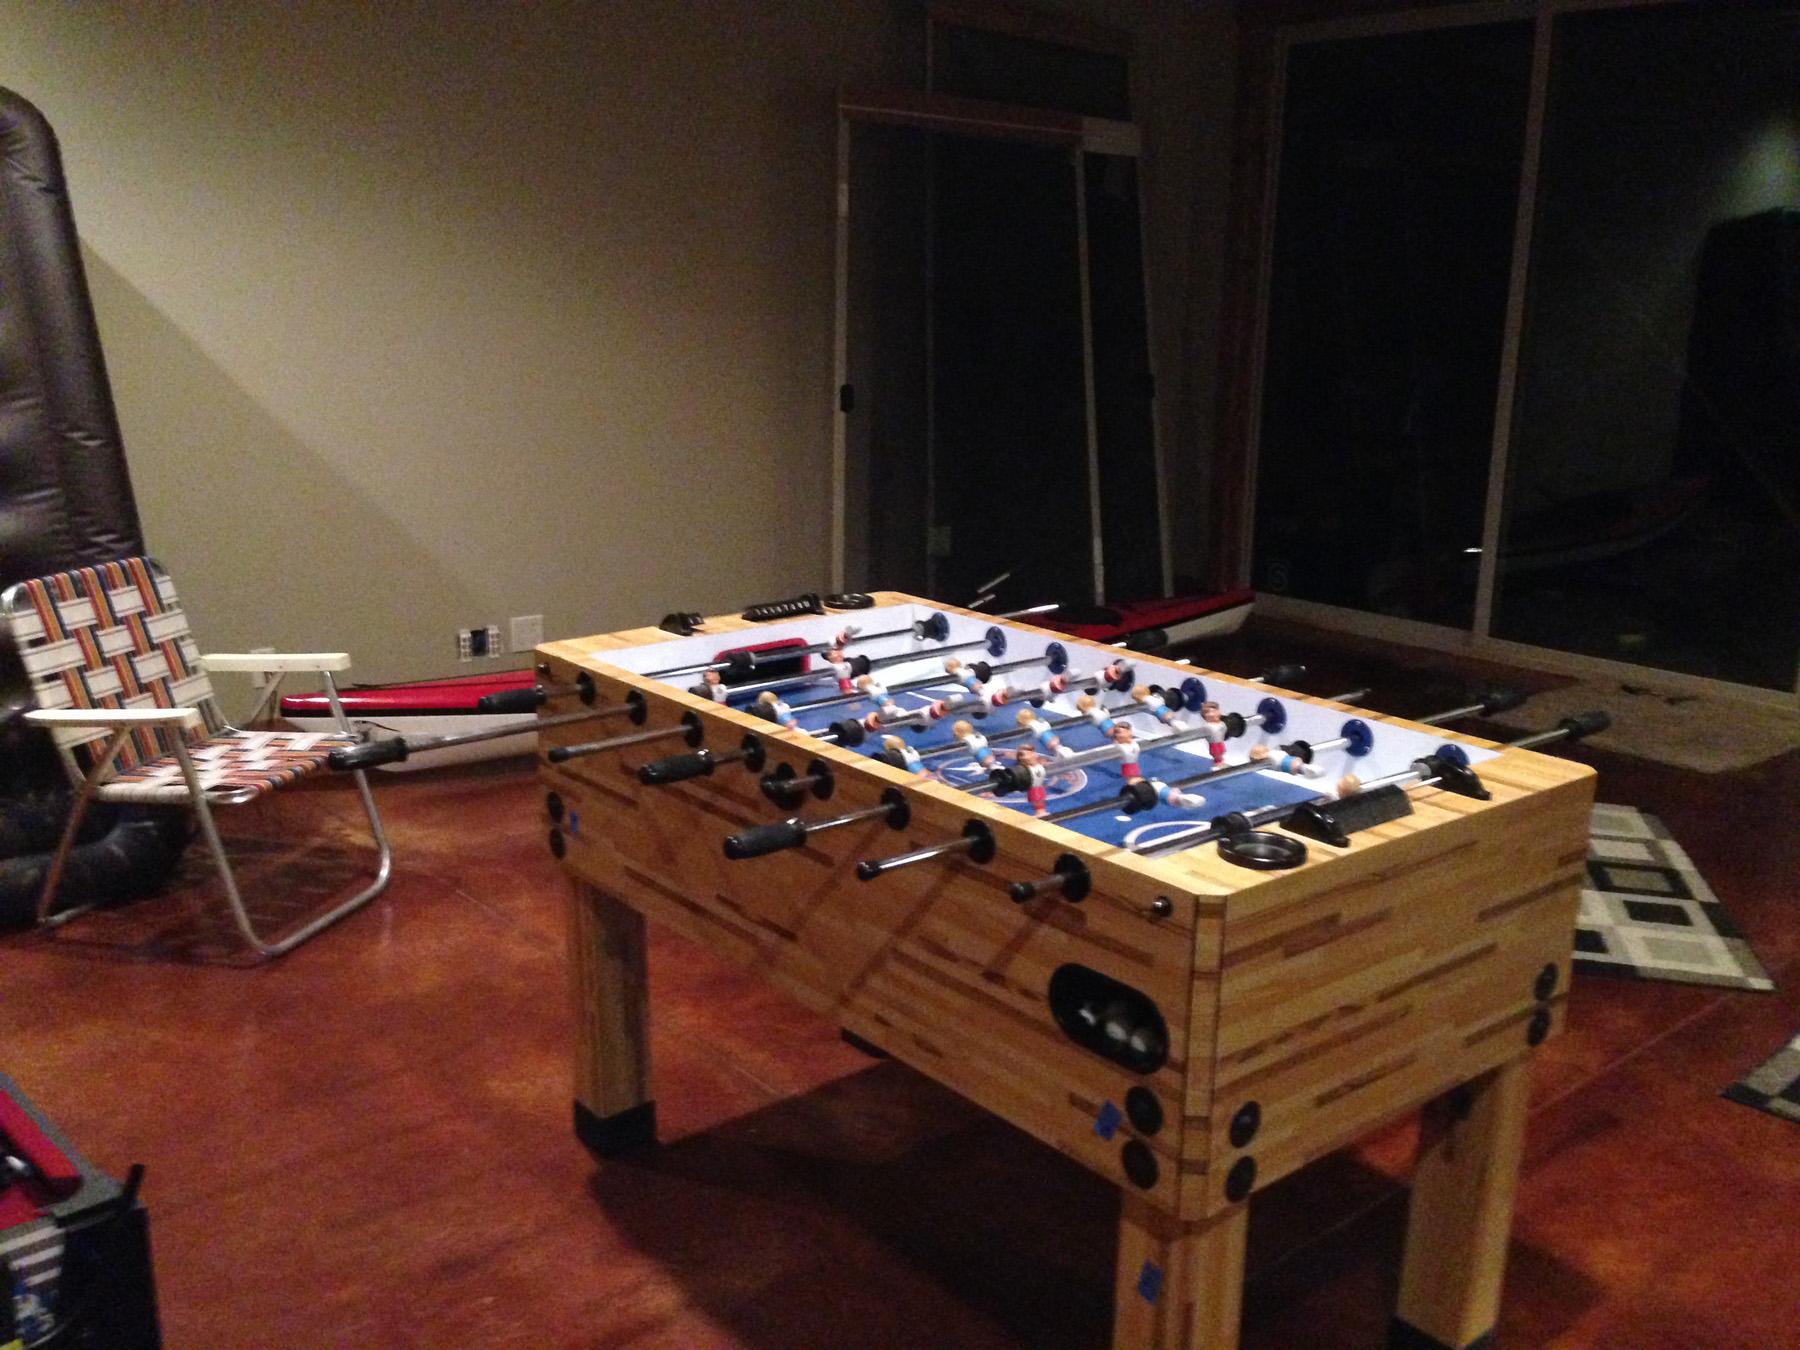 Recreation Room - Foozball Table